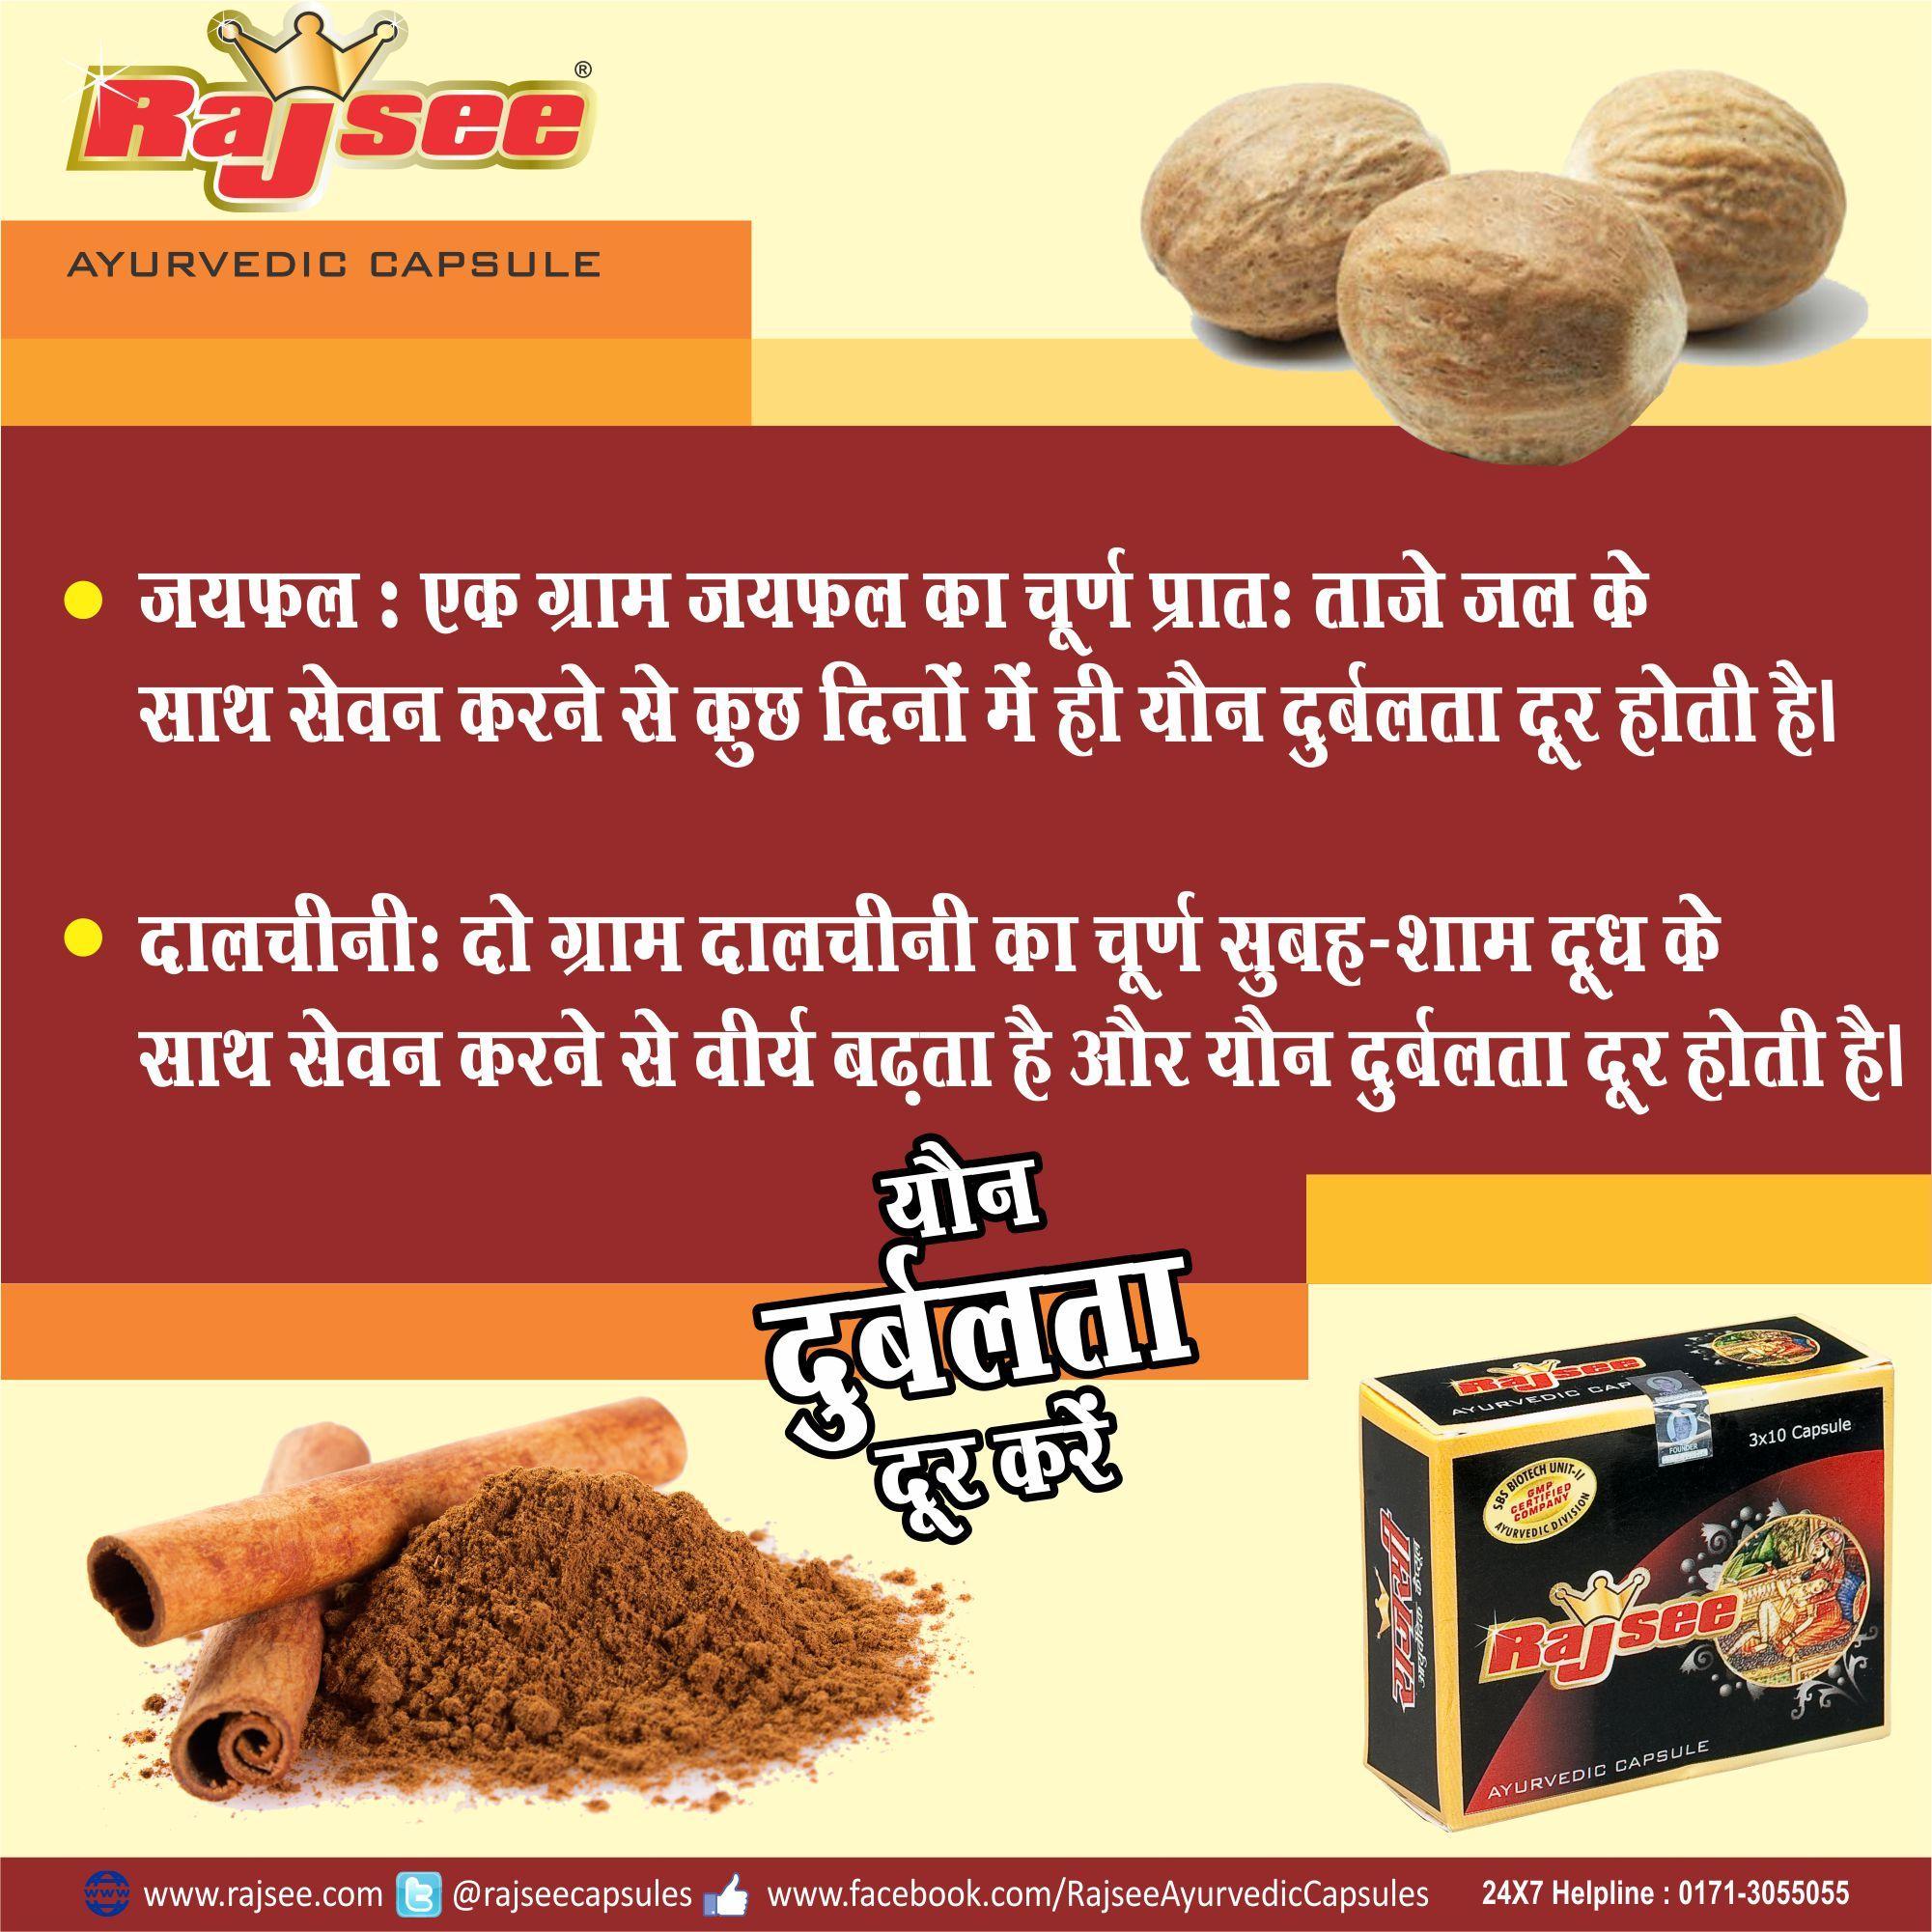 Rajsee Health Tips - Benefits of Nutmeg (Jaiphal) & Dalchini